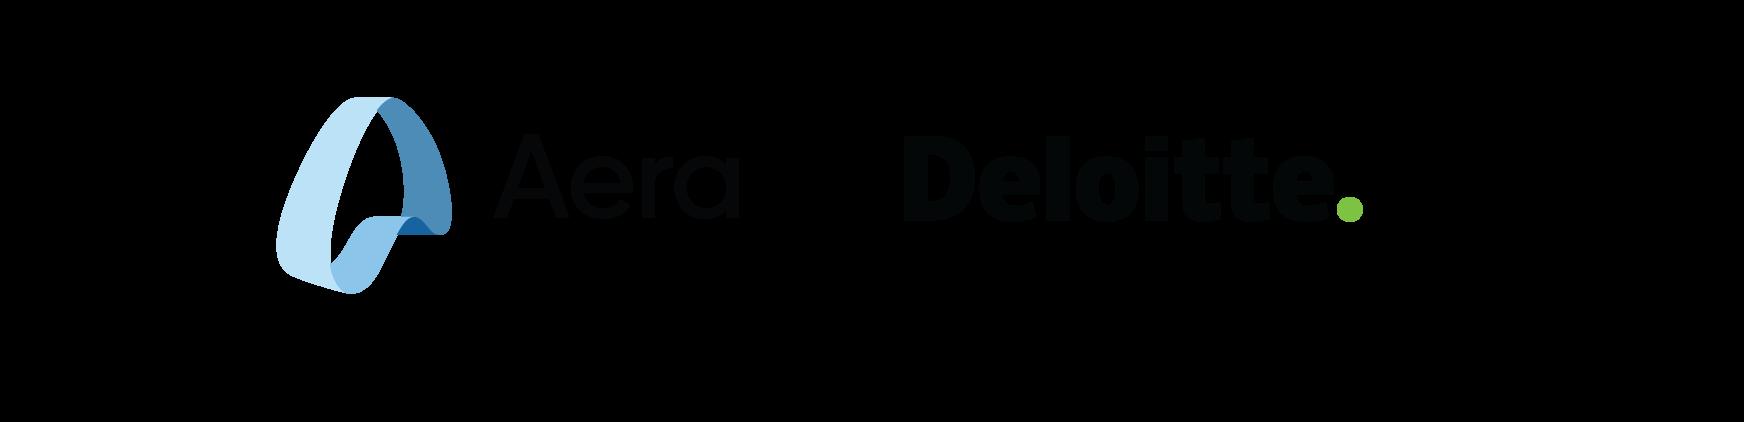 Aera-and-Deloitte_EMAIL-WEBINARS